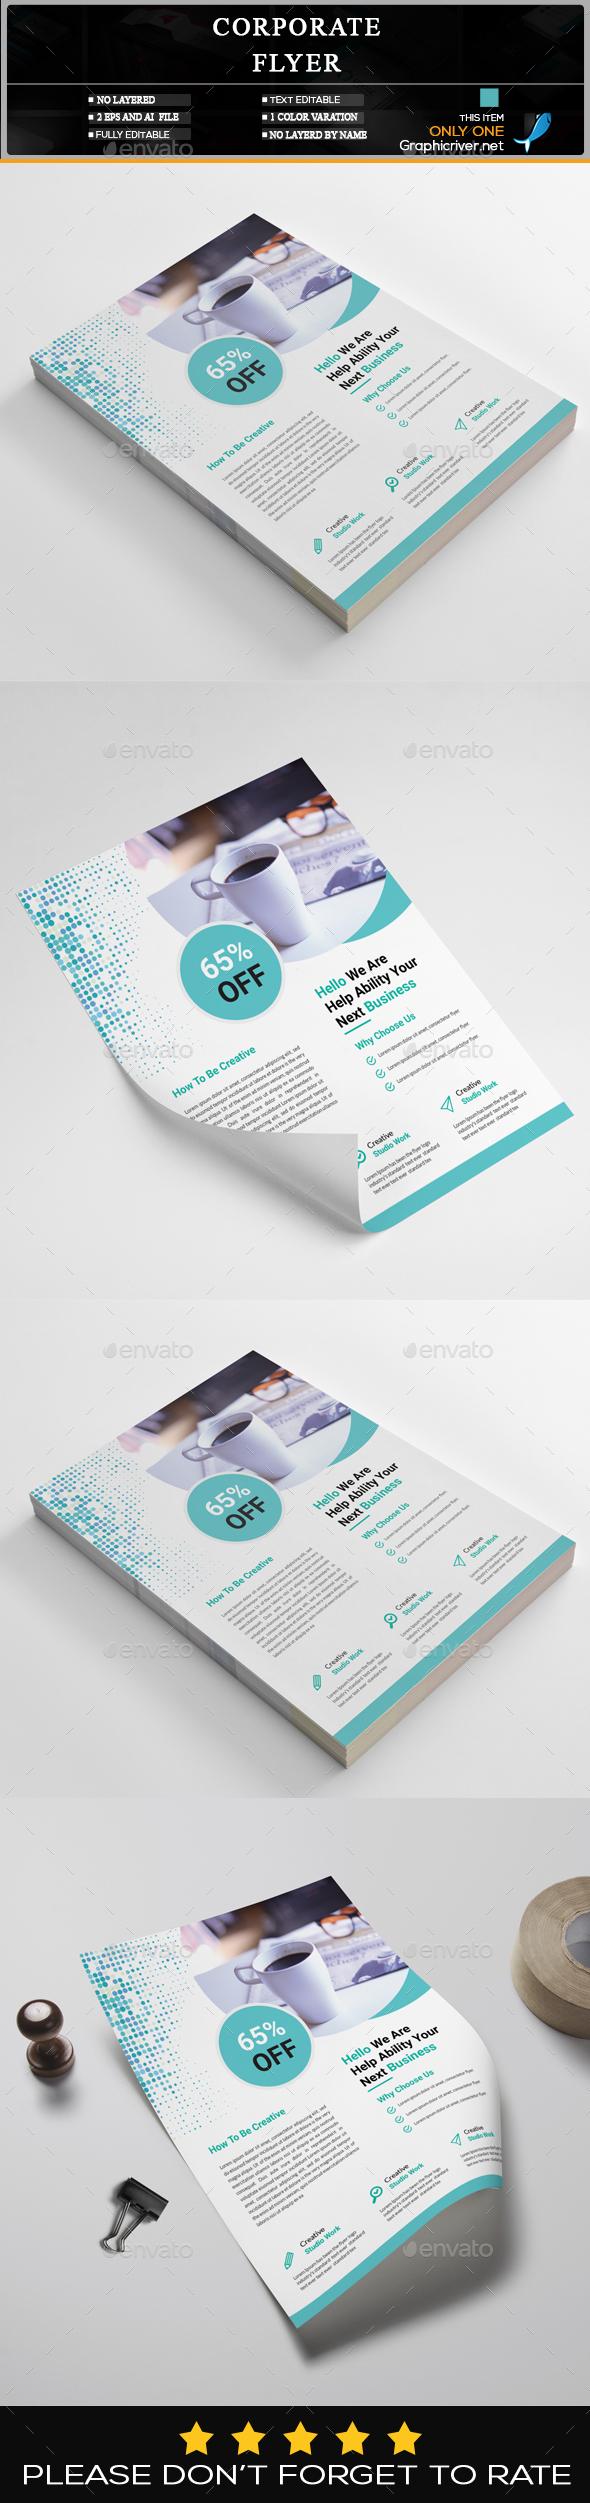 GraphicRiver Corporate Flyer 20462264